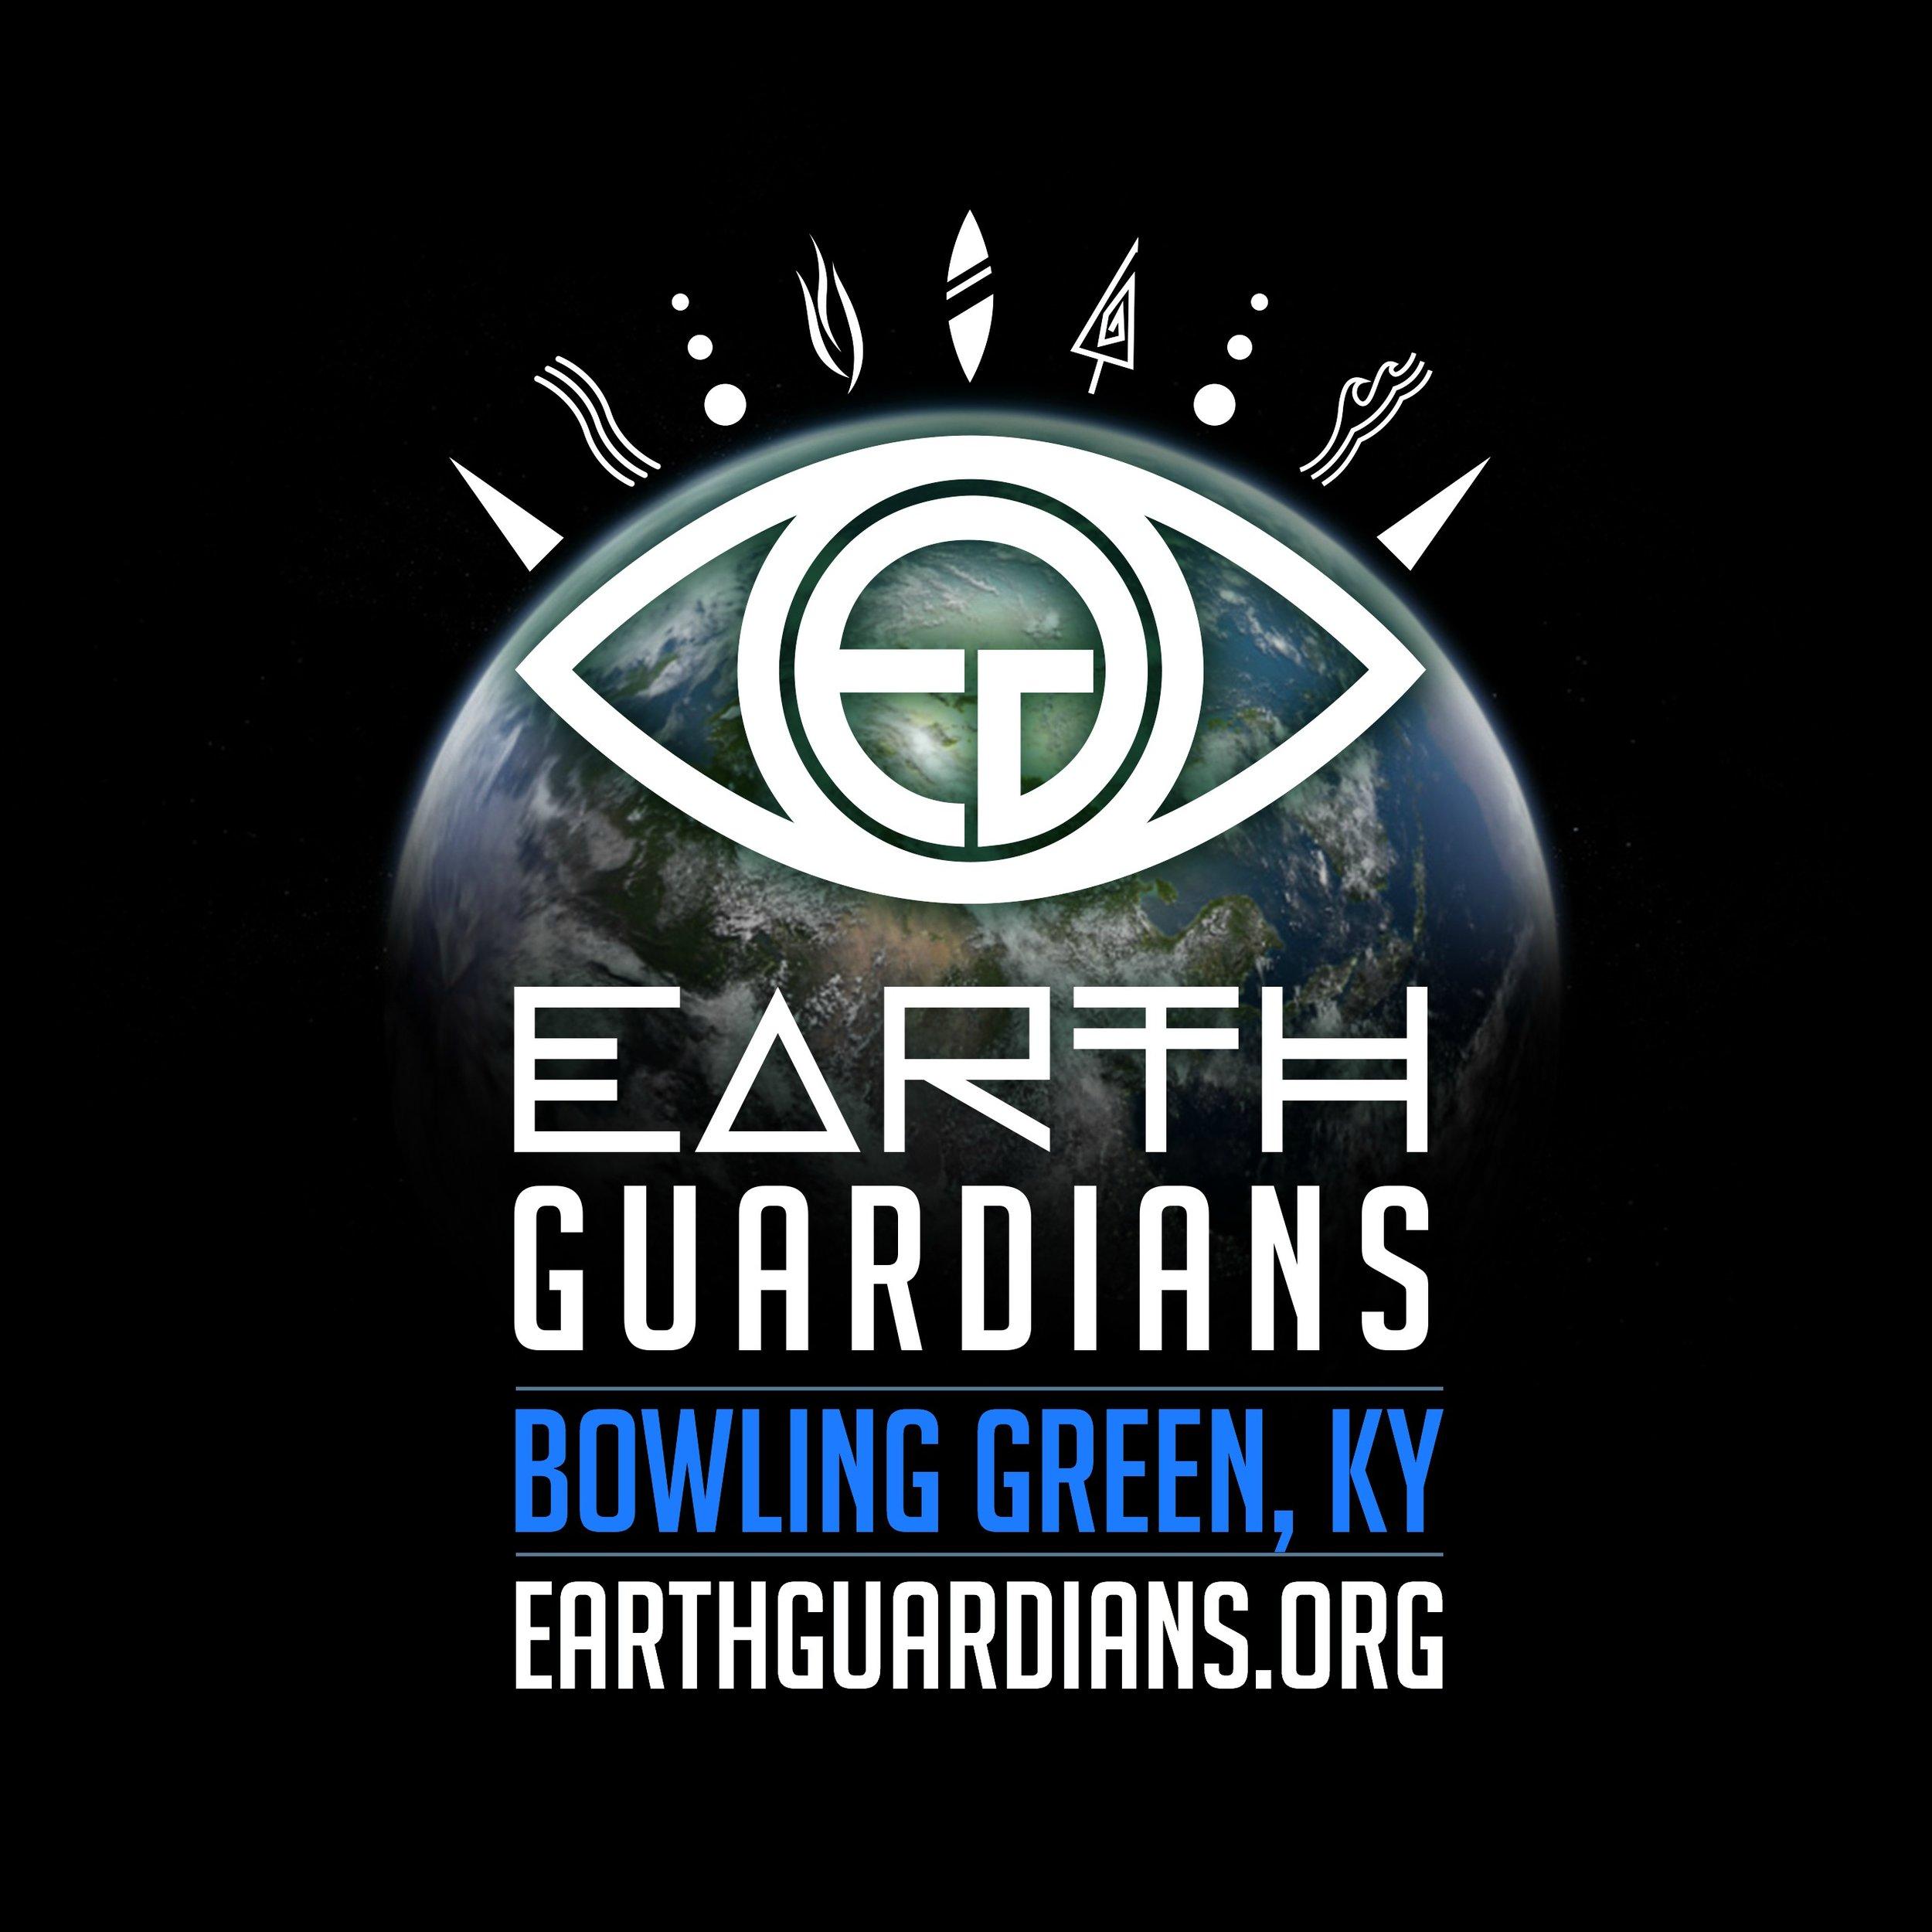 EG_crew logo BOWLING GREEN.jpg